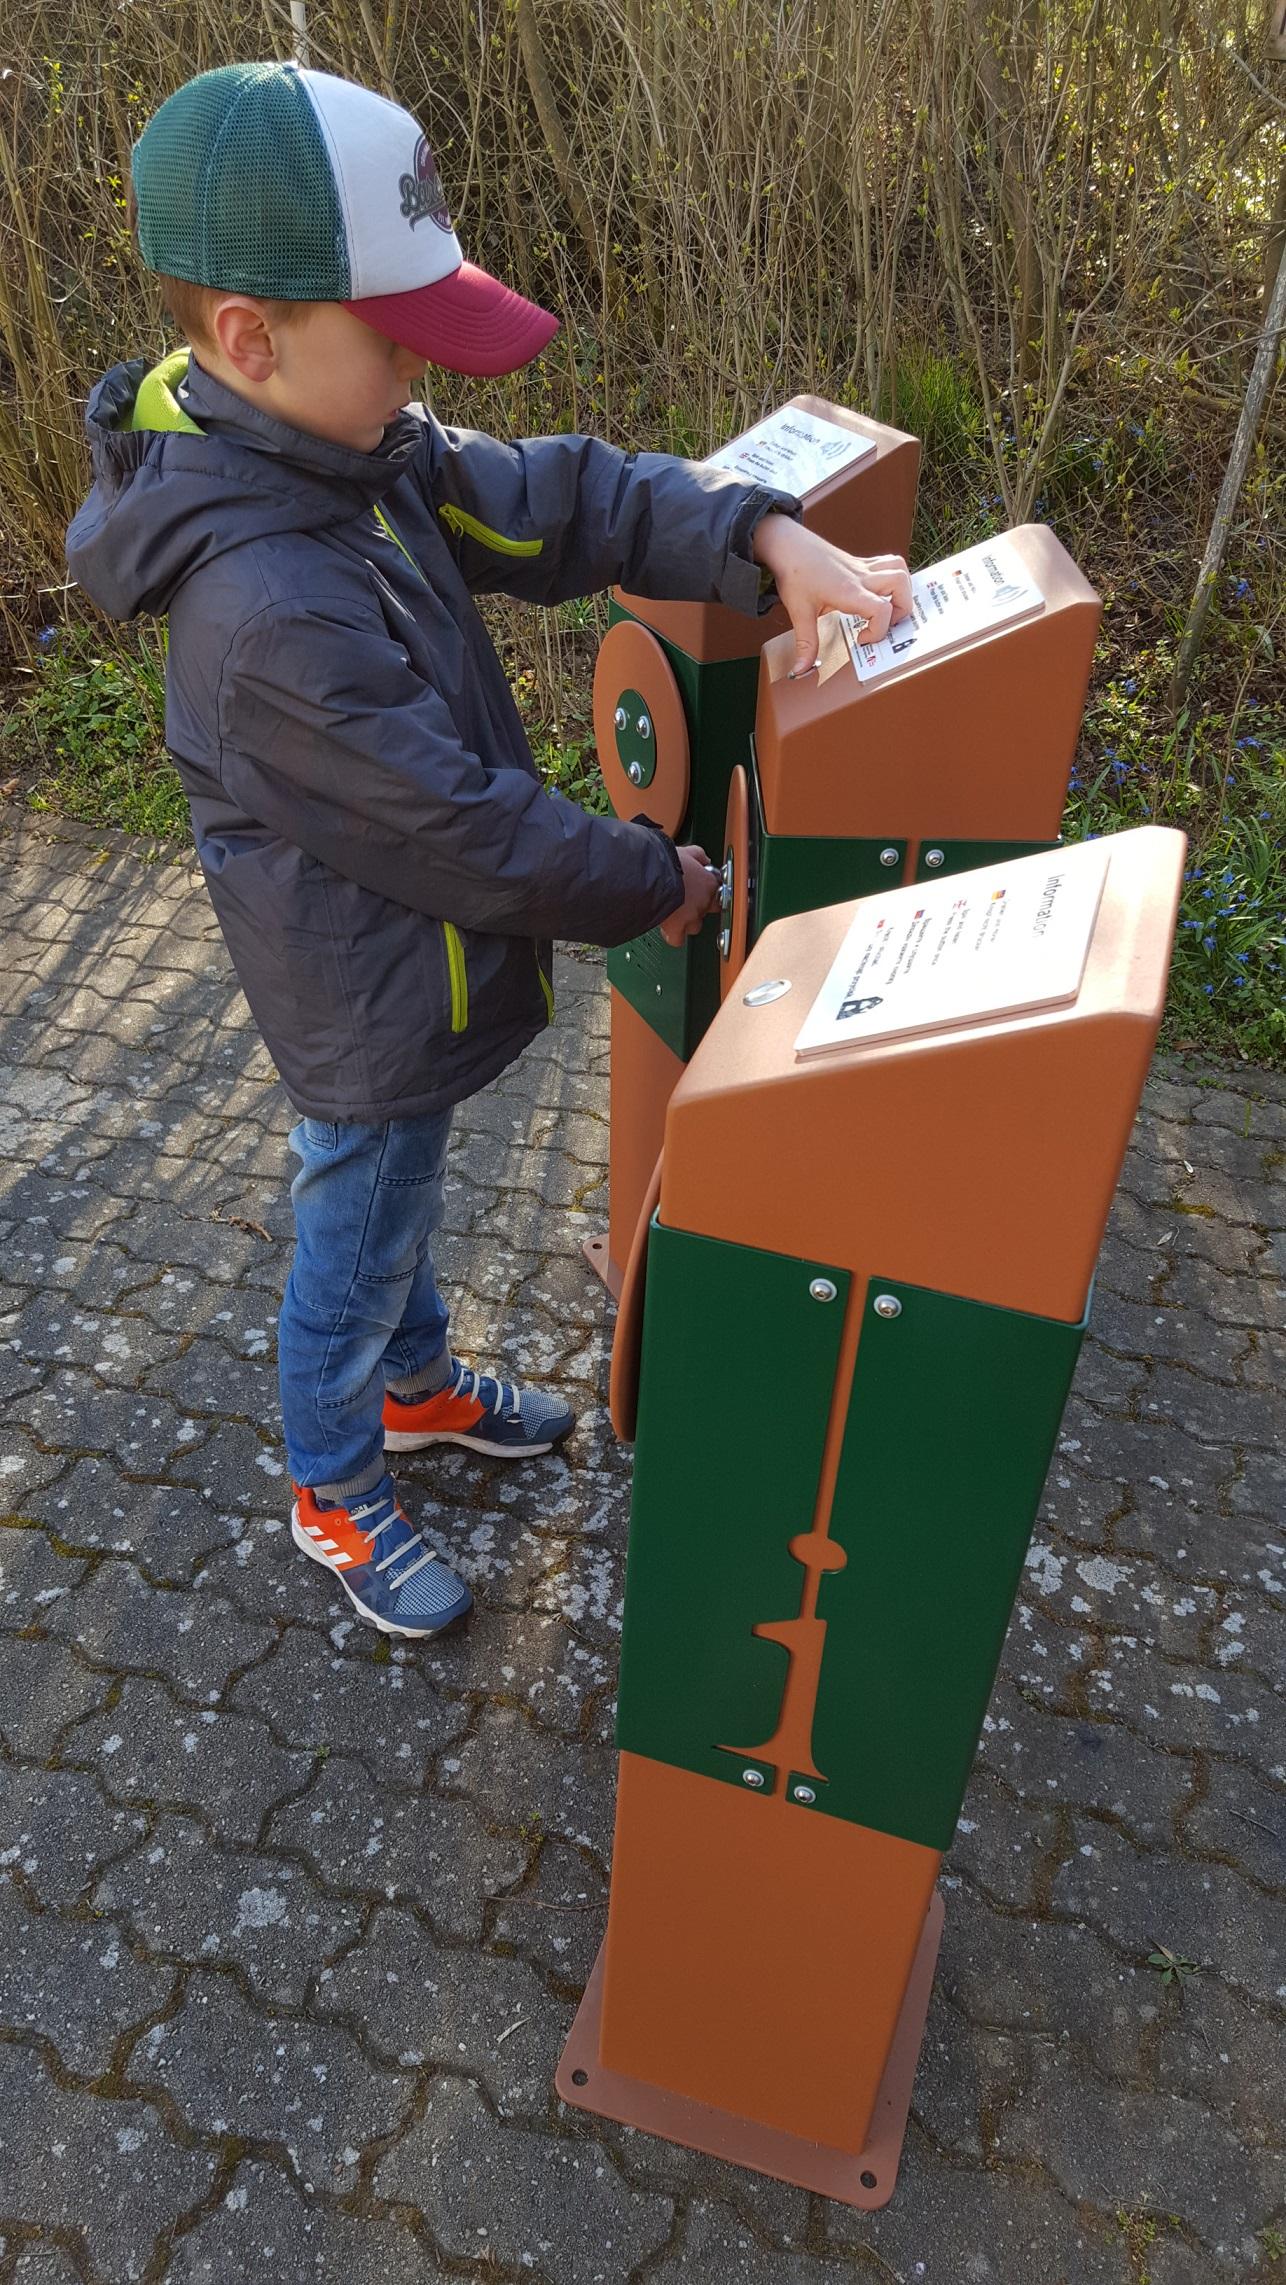 Kid using Playnetic AudioColumn